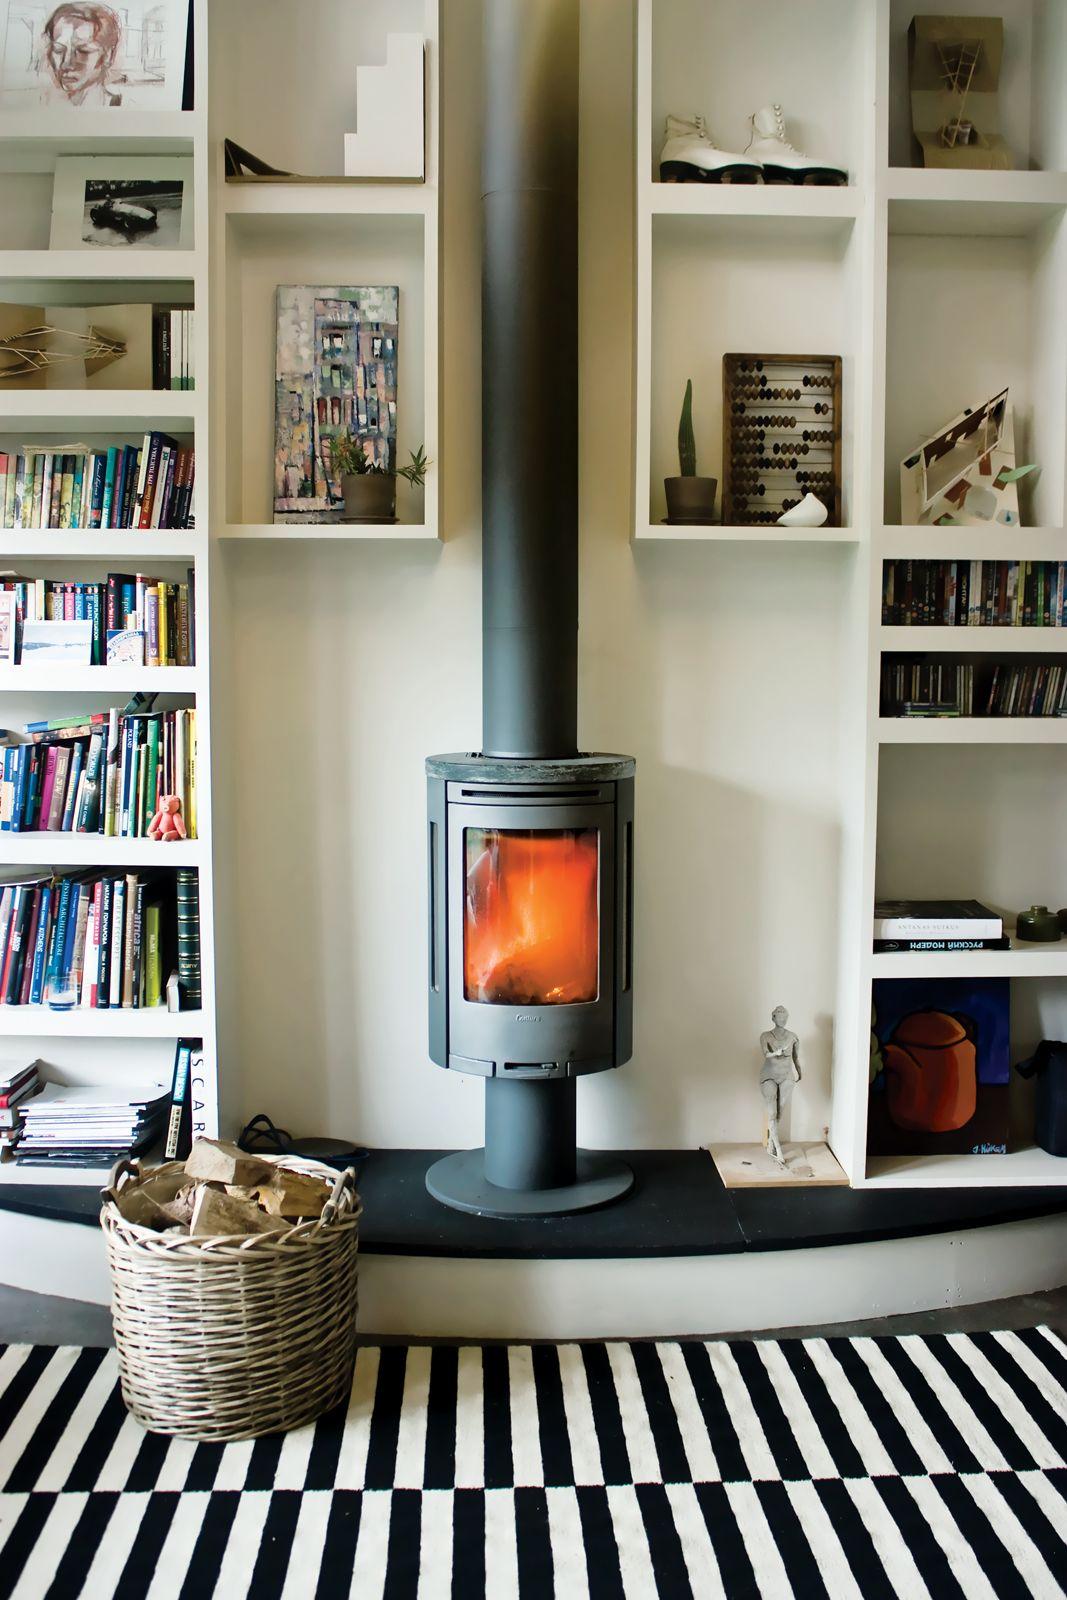 Pin By Mindy Pellegrini On Home Modern Wood Burning Stoves Stove Decor Small Wood Burning Stove